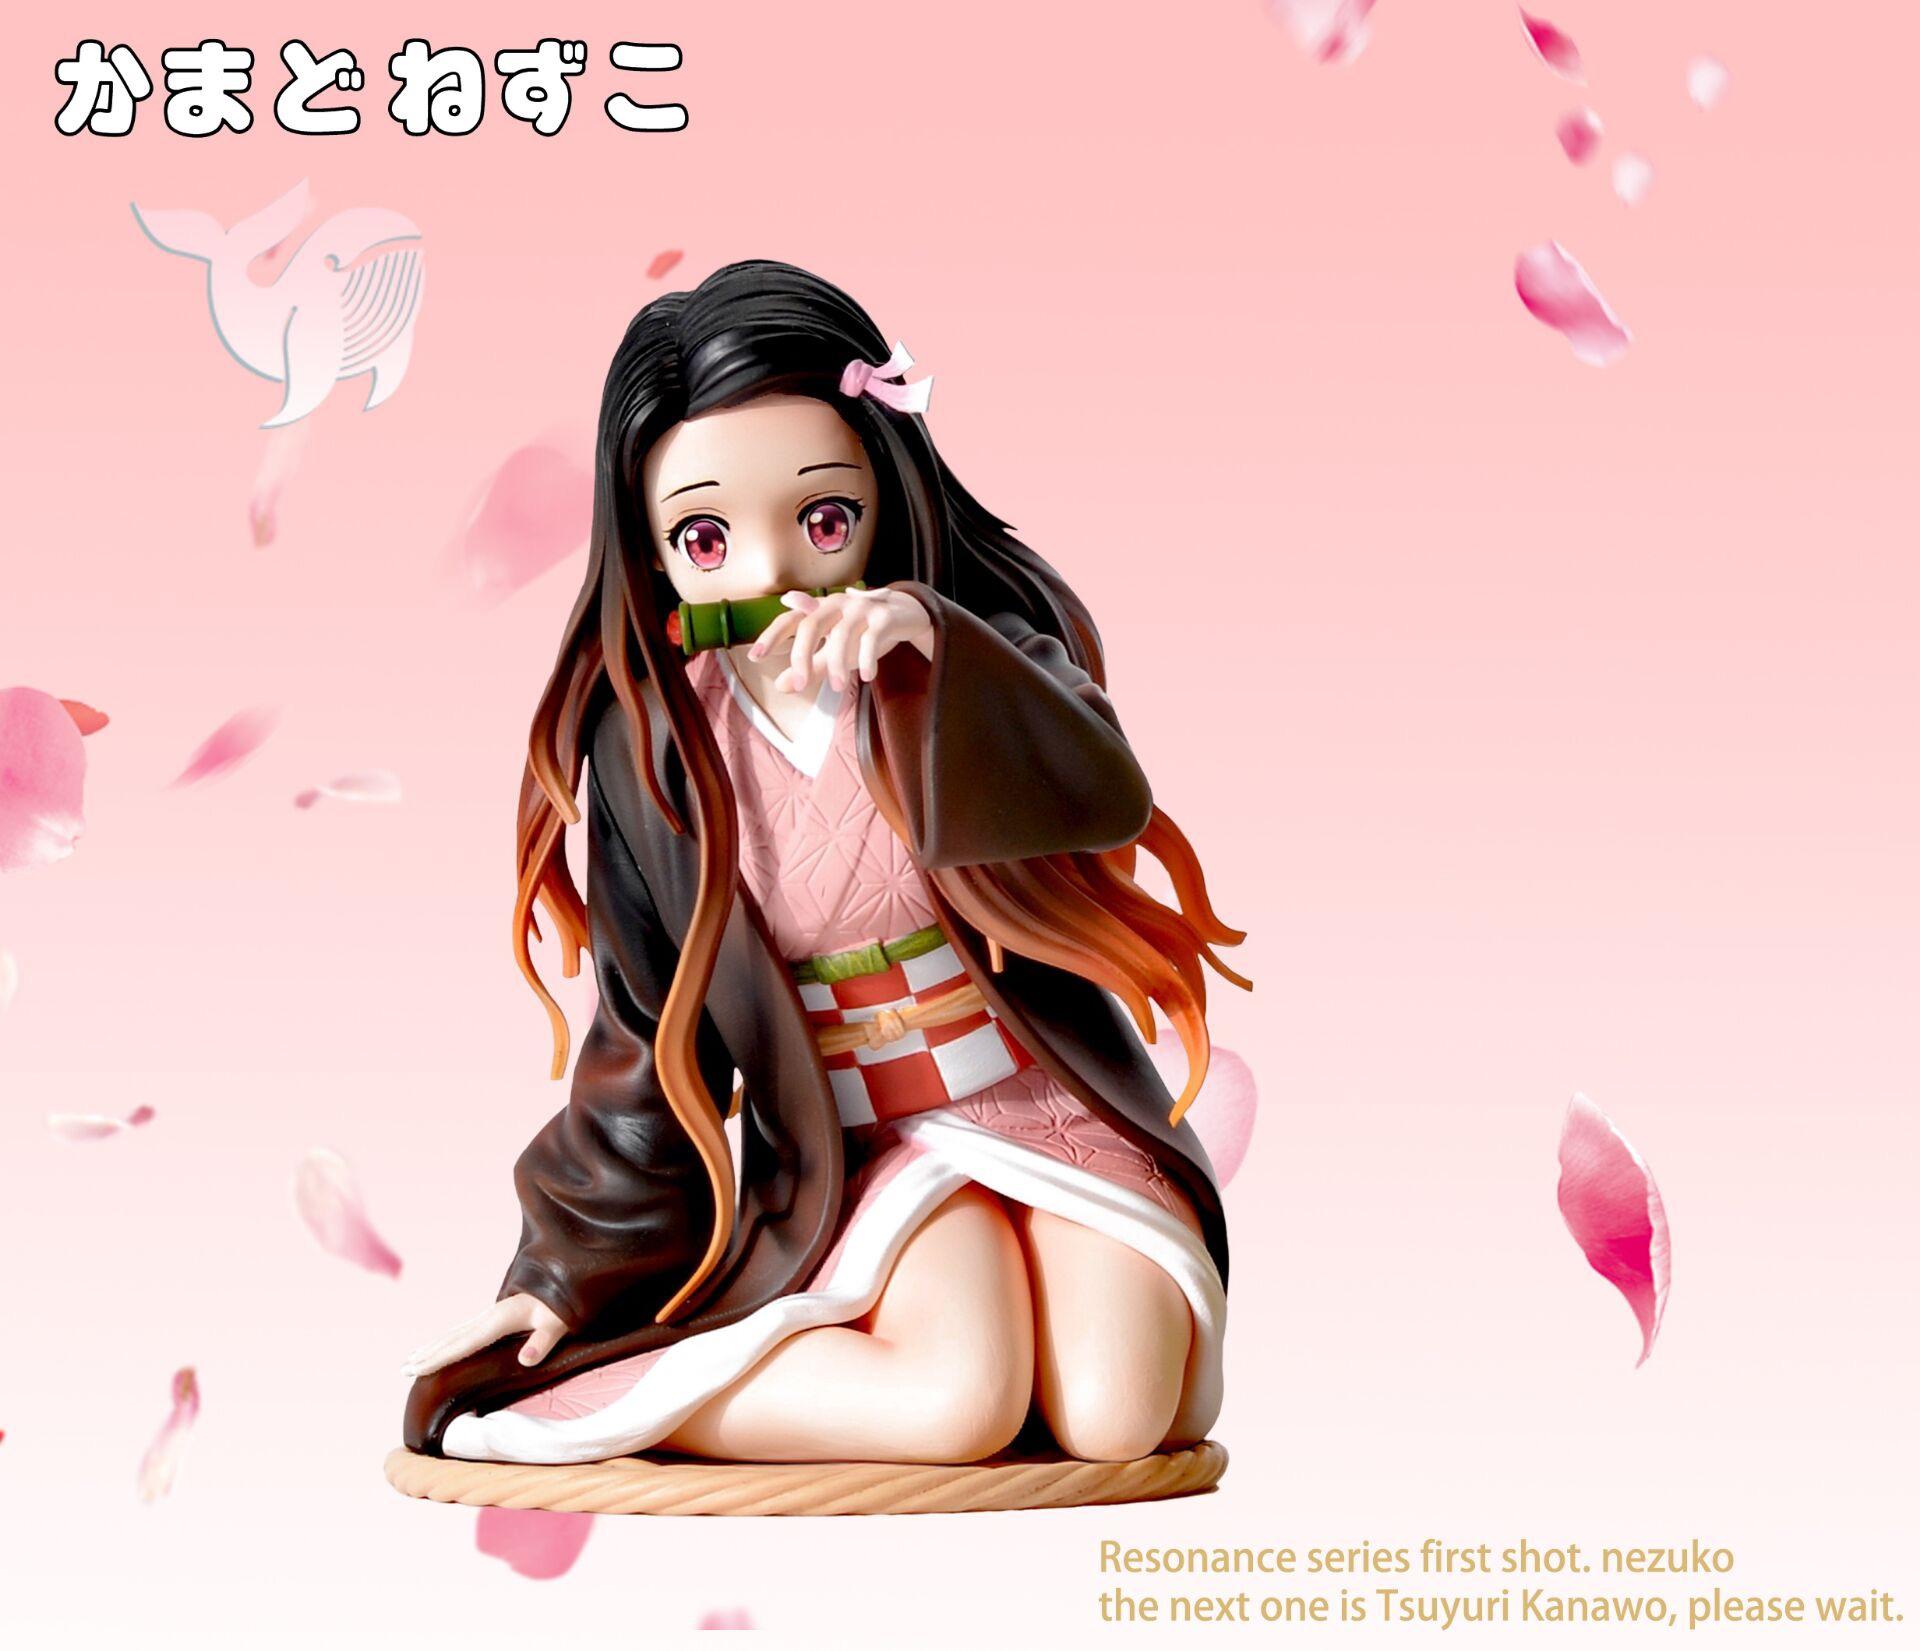 B  Nezuko น้องเนซึโกะ  Whale (มัดจำ)